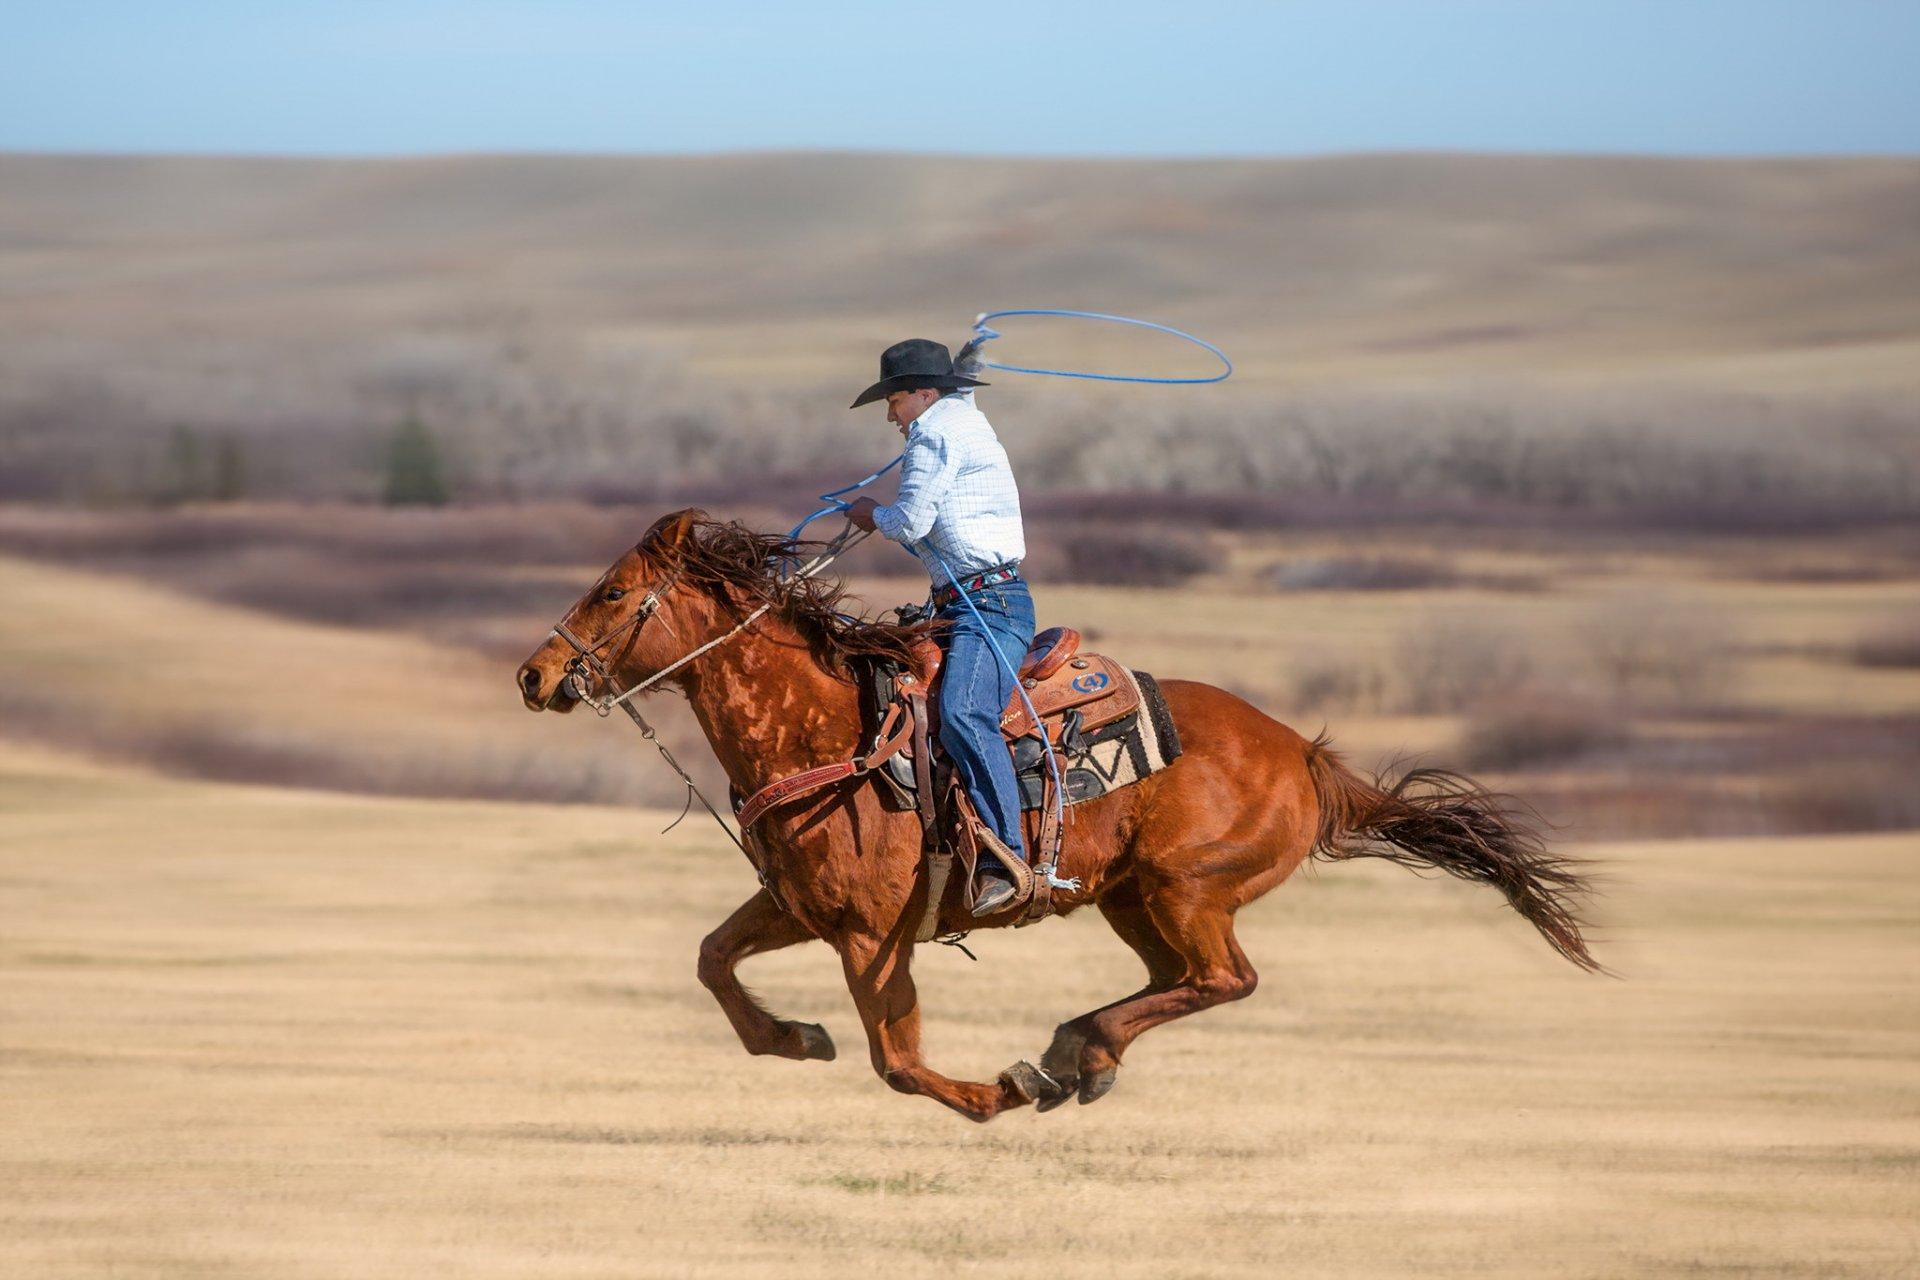 Ковбой картинки на коне